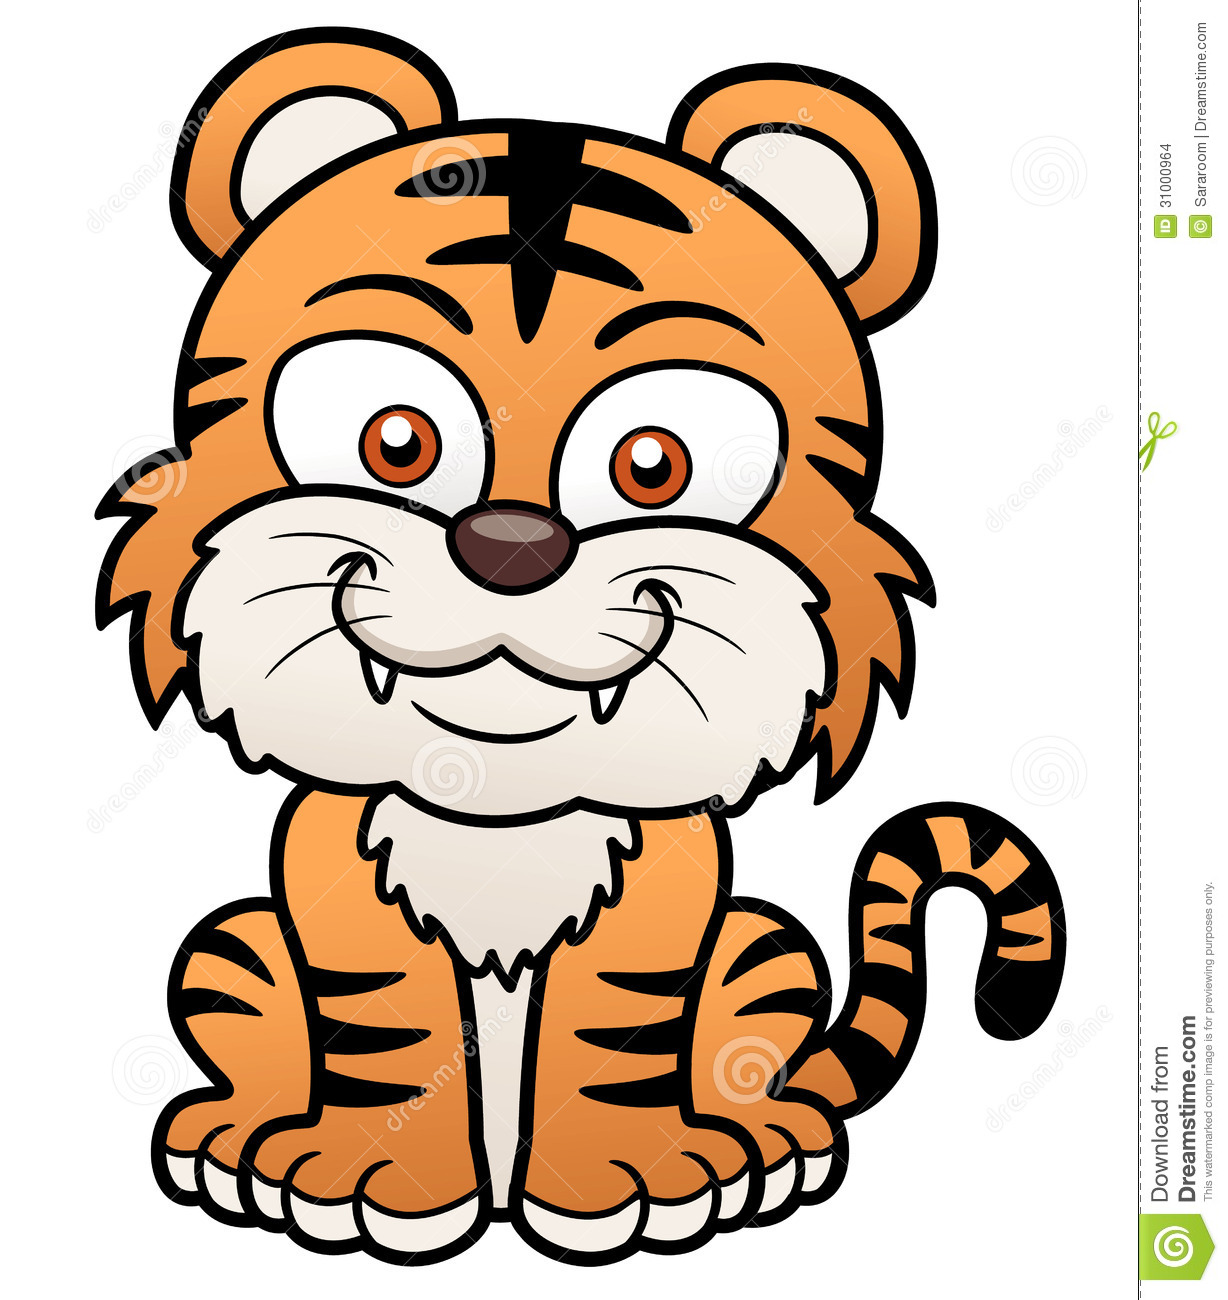 Tiger Cartoon Images 1228x1300